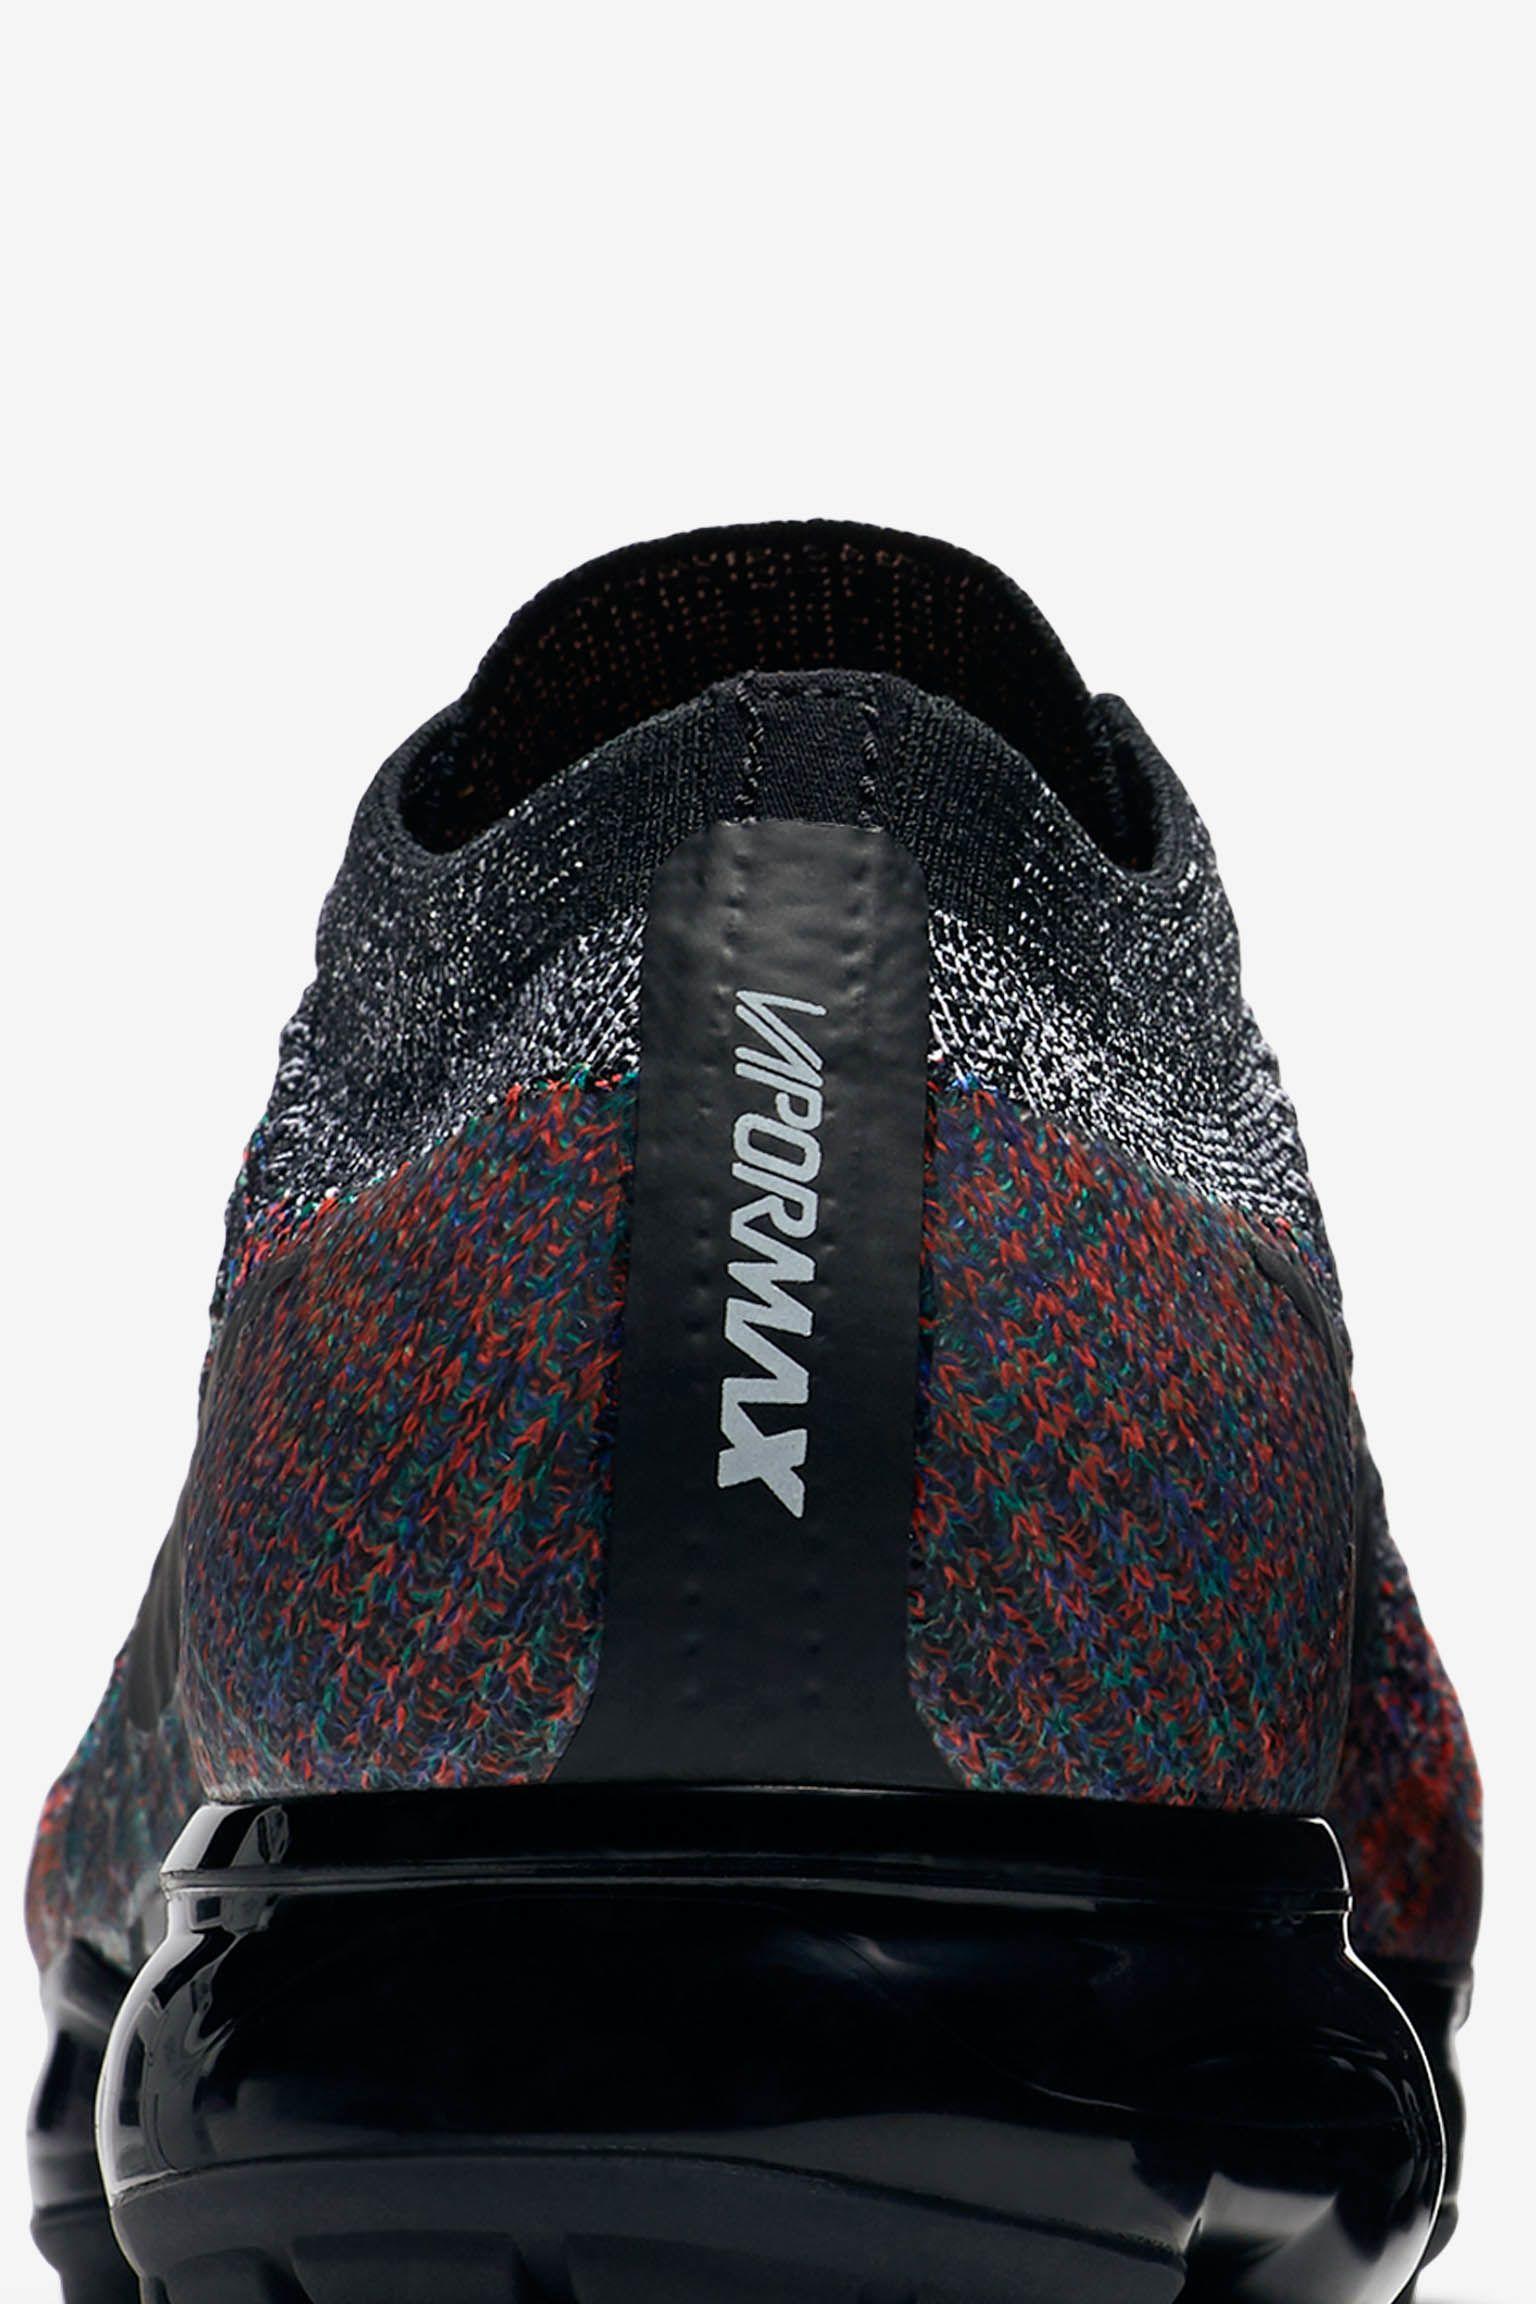 Nike Air Vapormax 'Black & Bright Crimson & Racer Blue' 发布日期